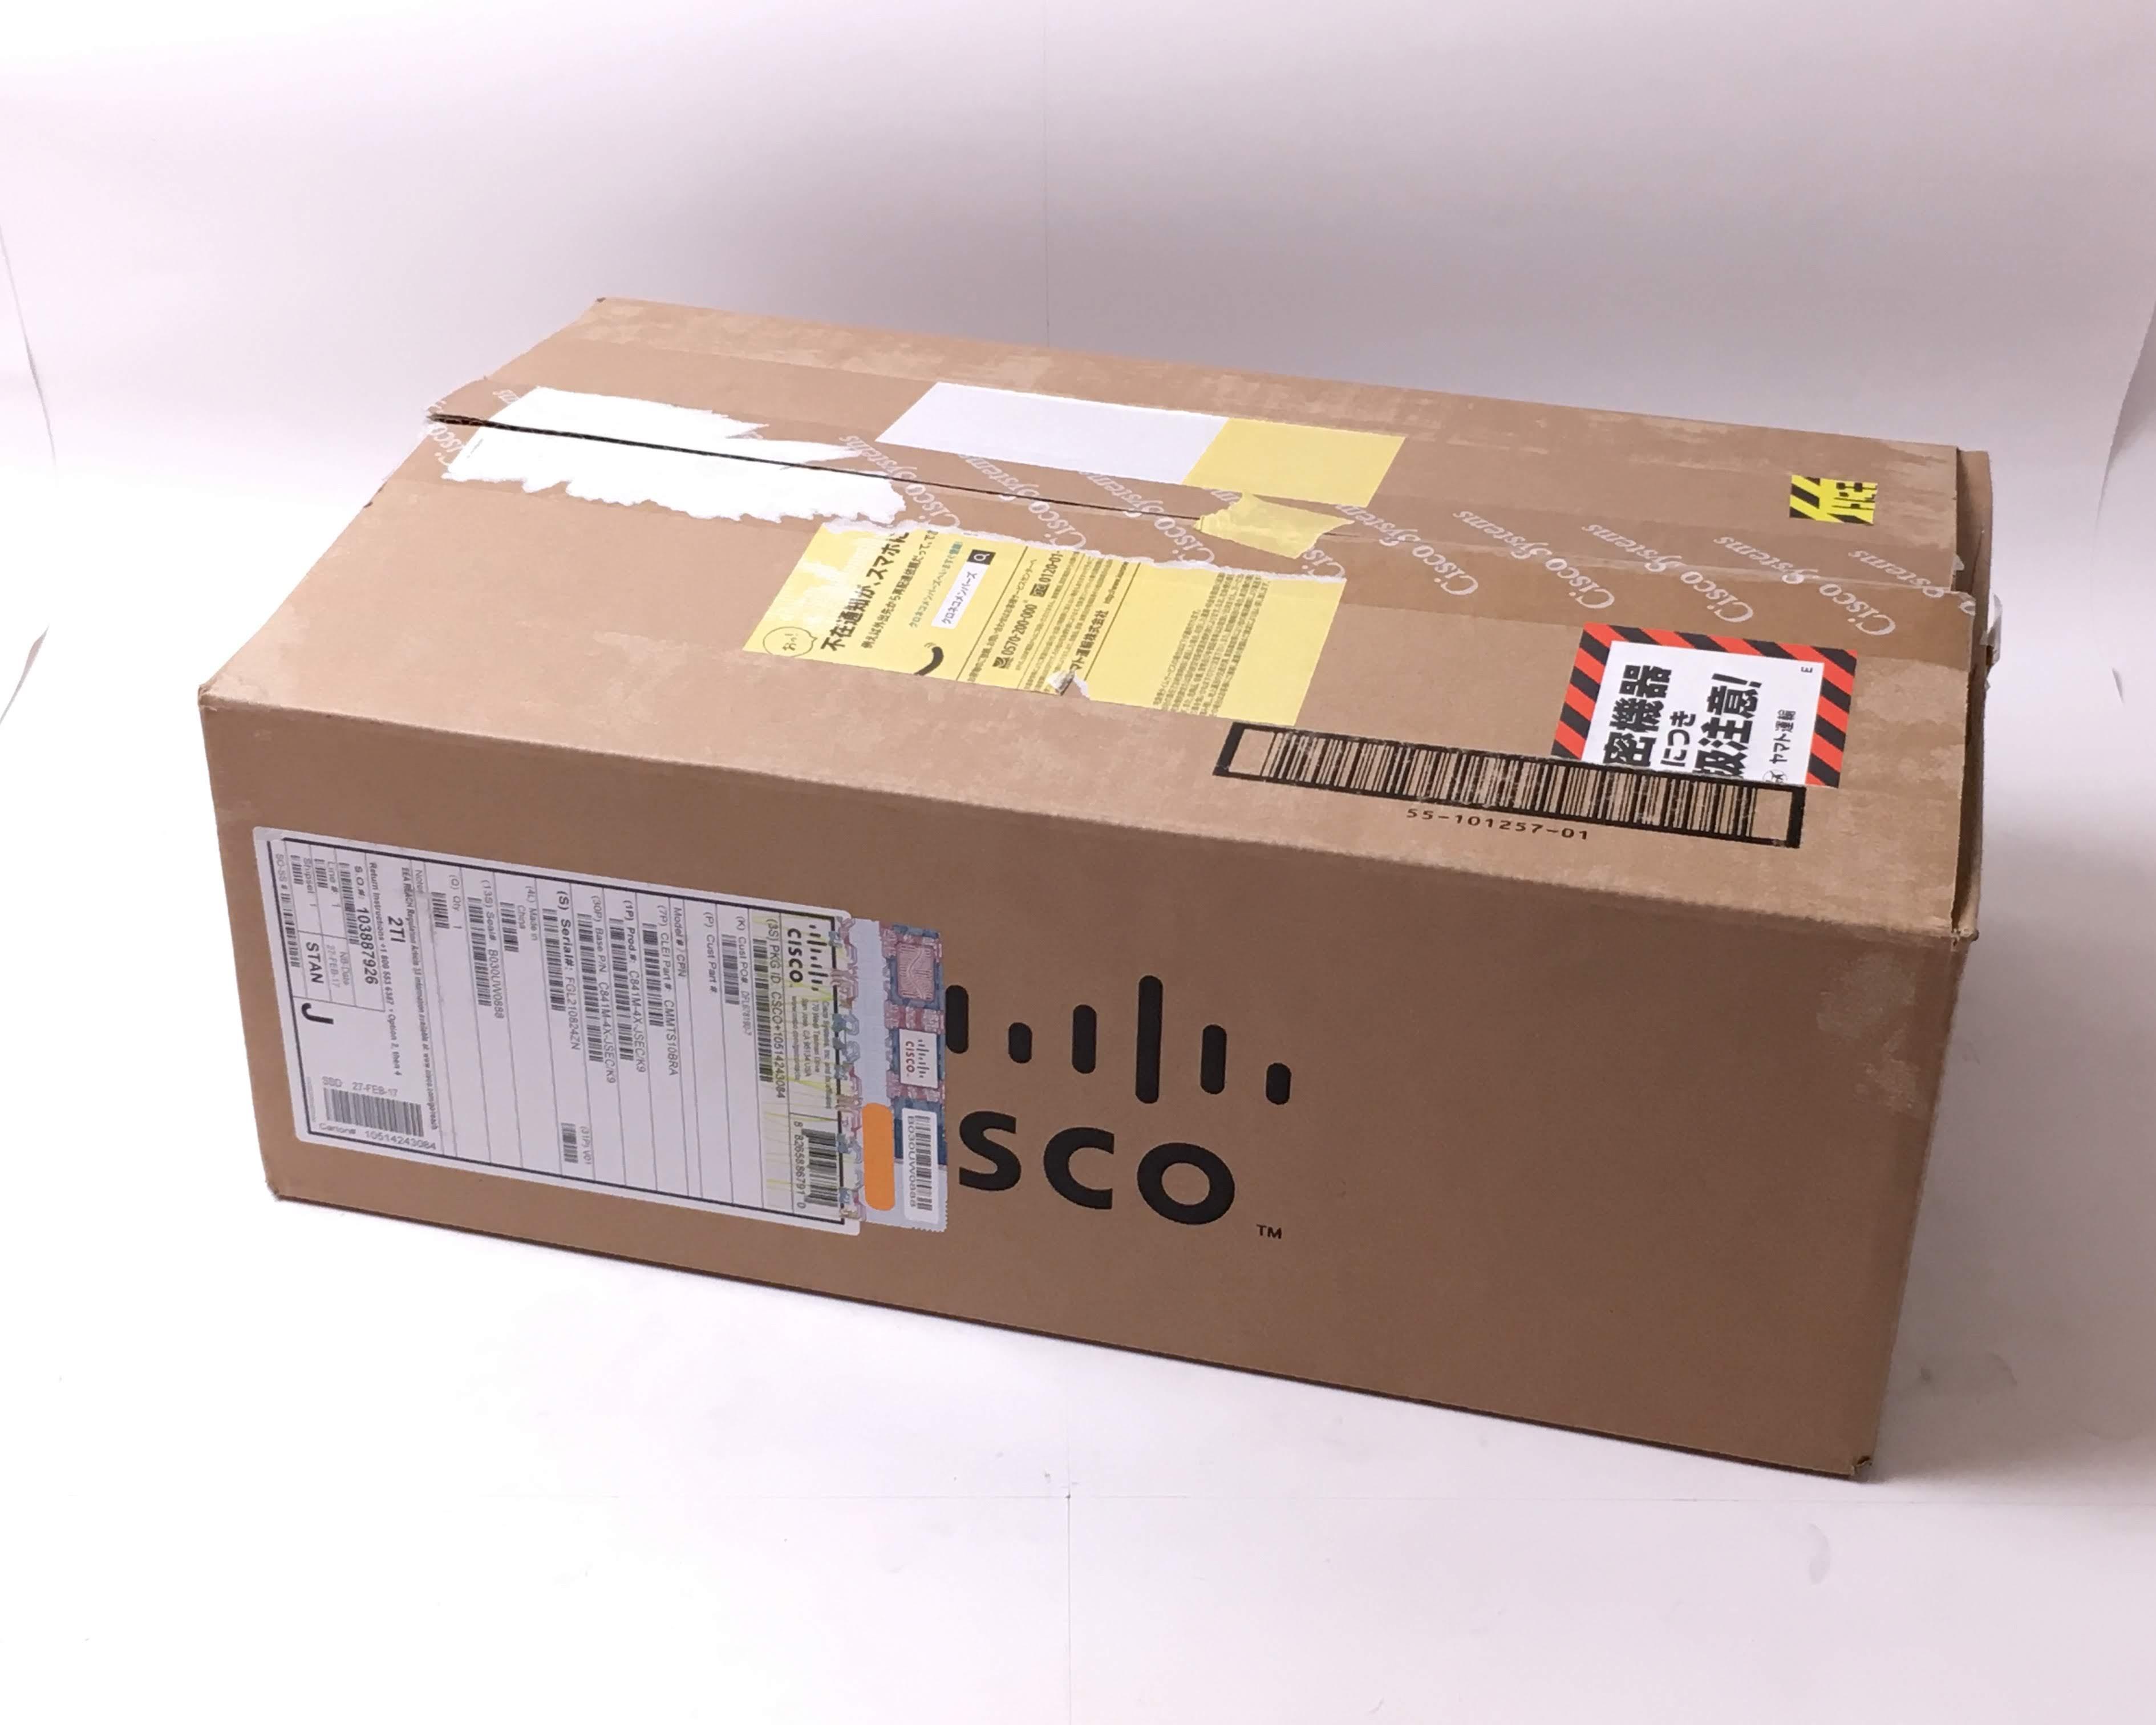 【新品】Cisco 841M Jシリーズ C841M-4X-JSEC/K9 メイン画像